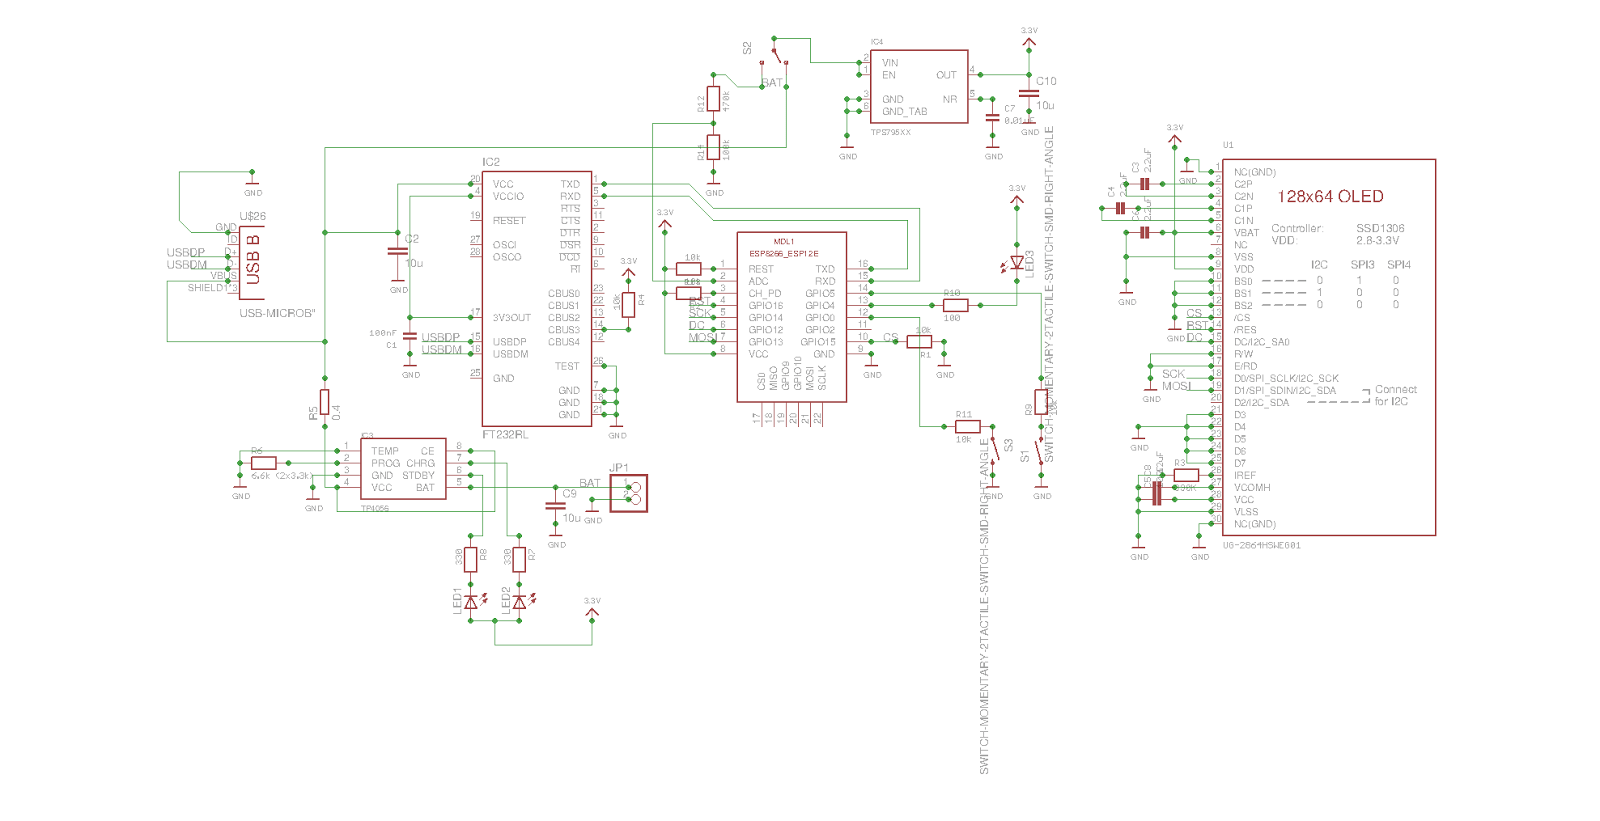 Esp12e Esp Smt Wireless Notifier With Oled Display